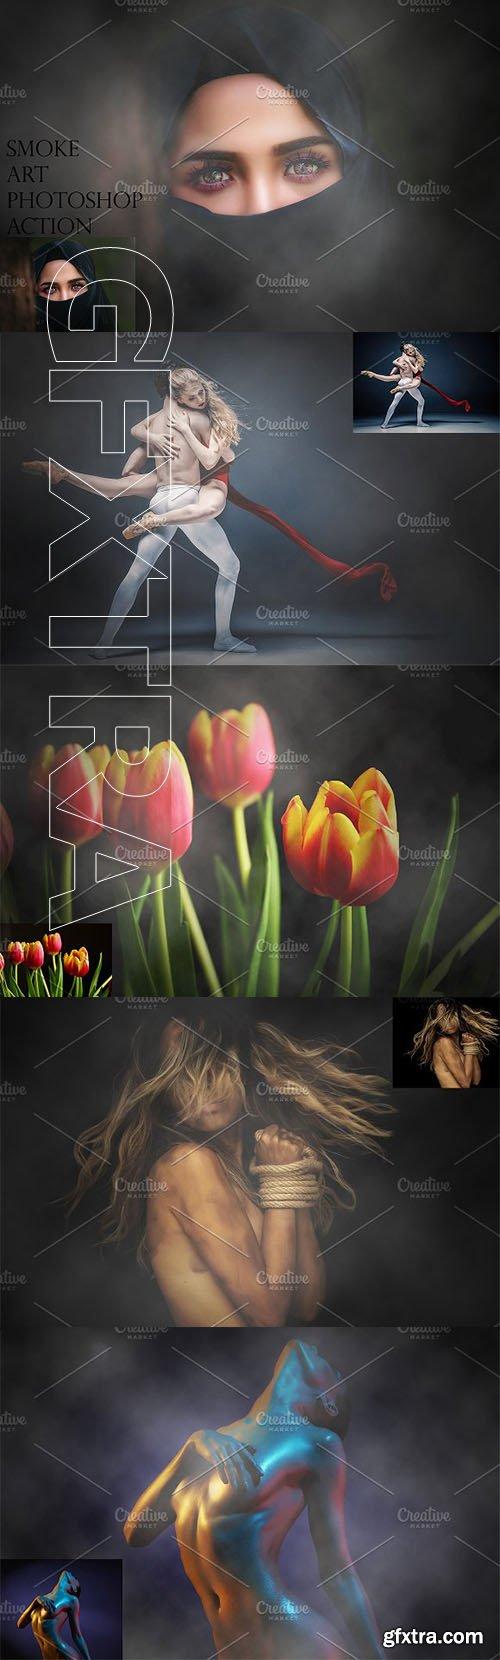 CreativeMarket - Smoke Art Photoshop Action 2555792